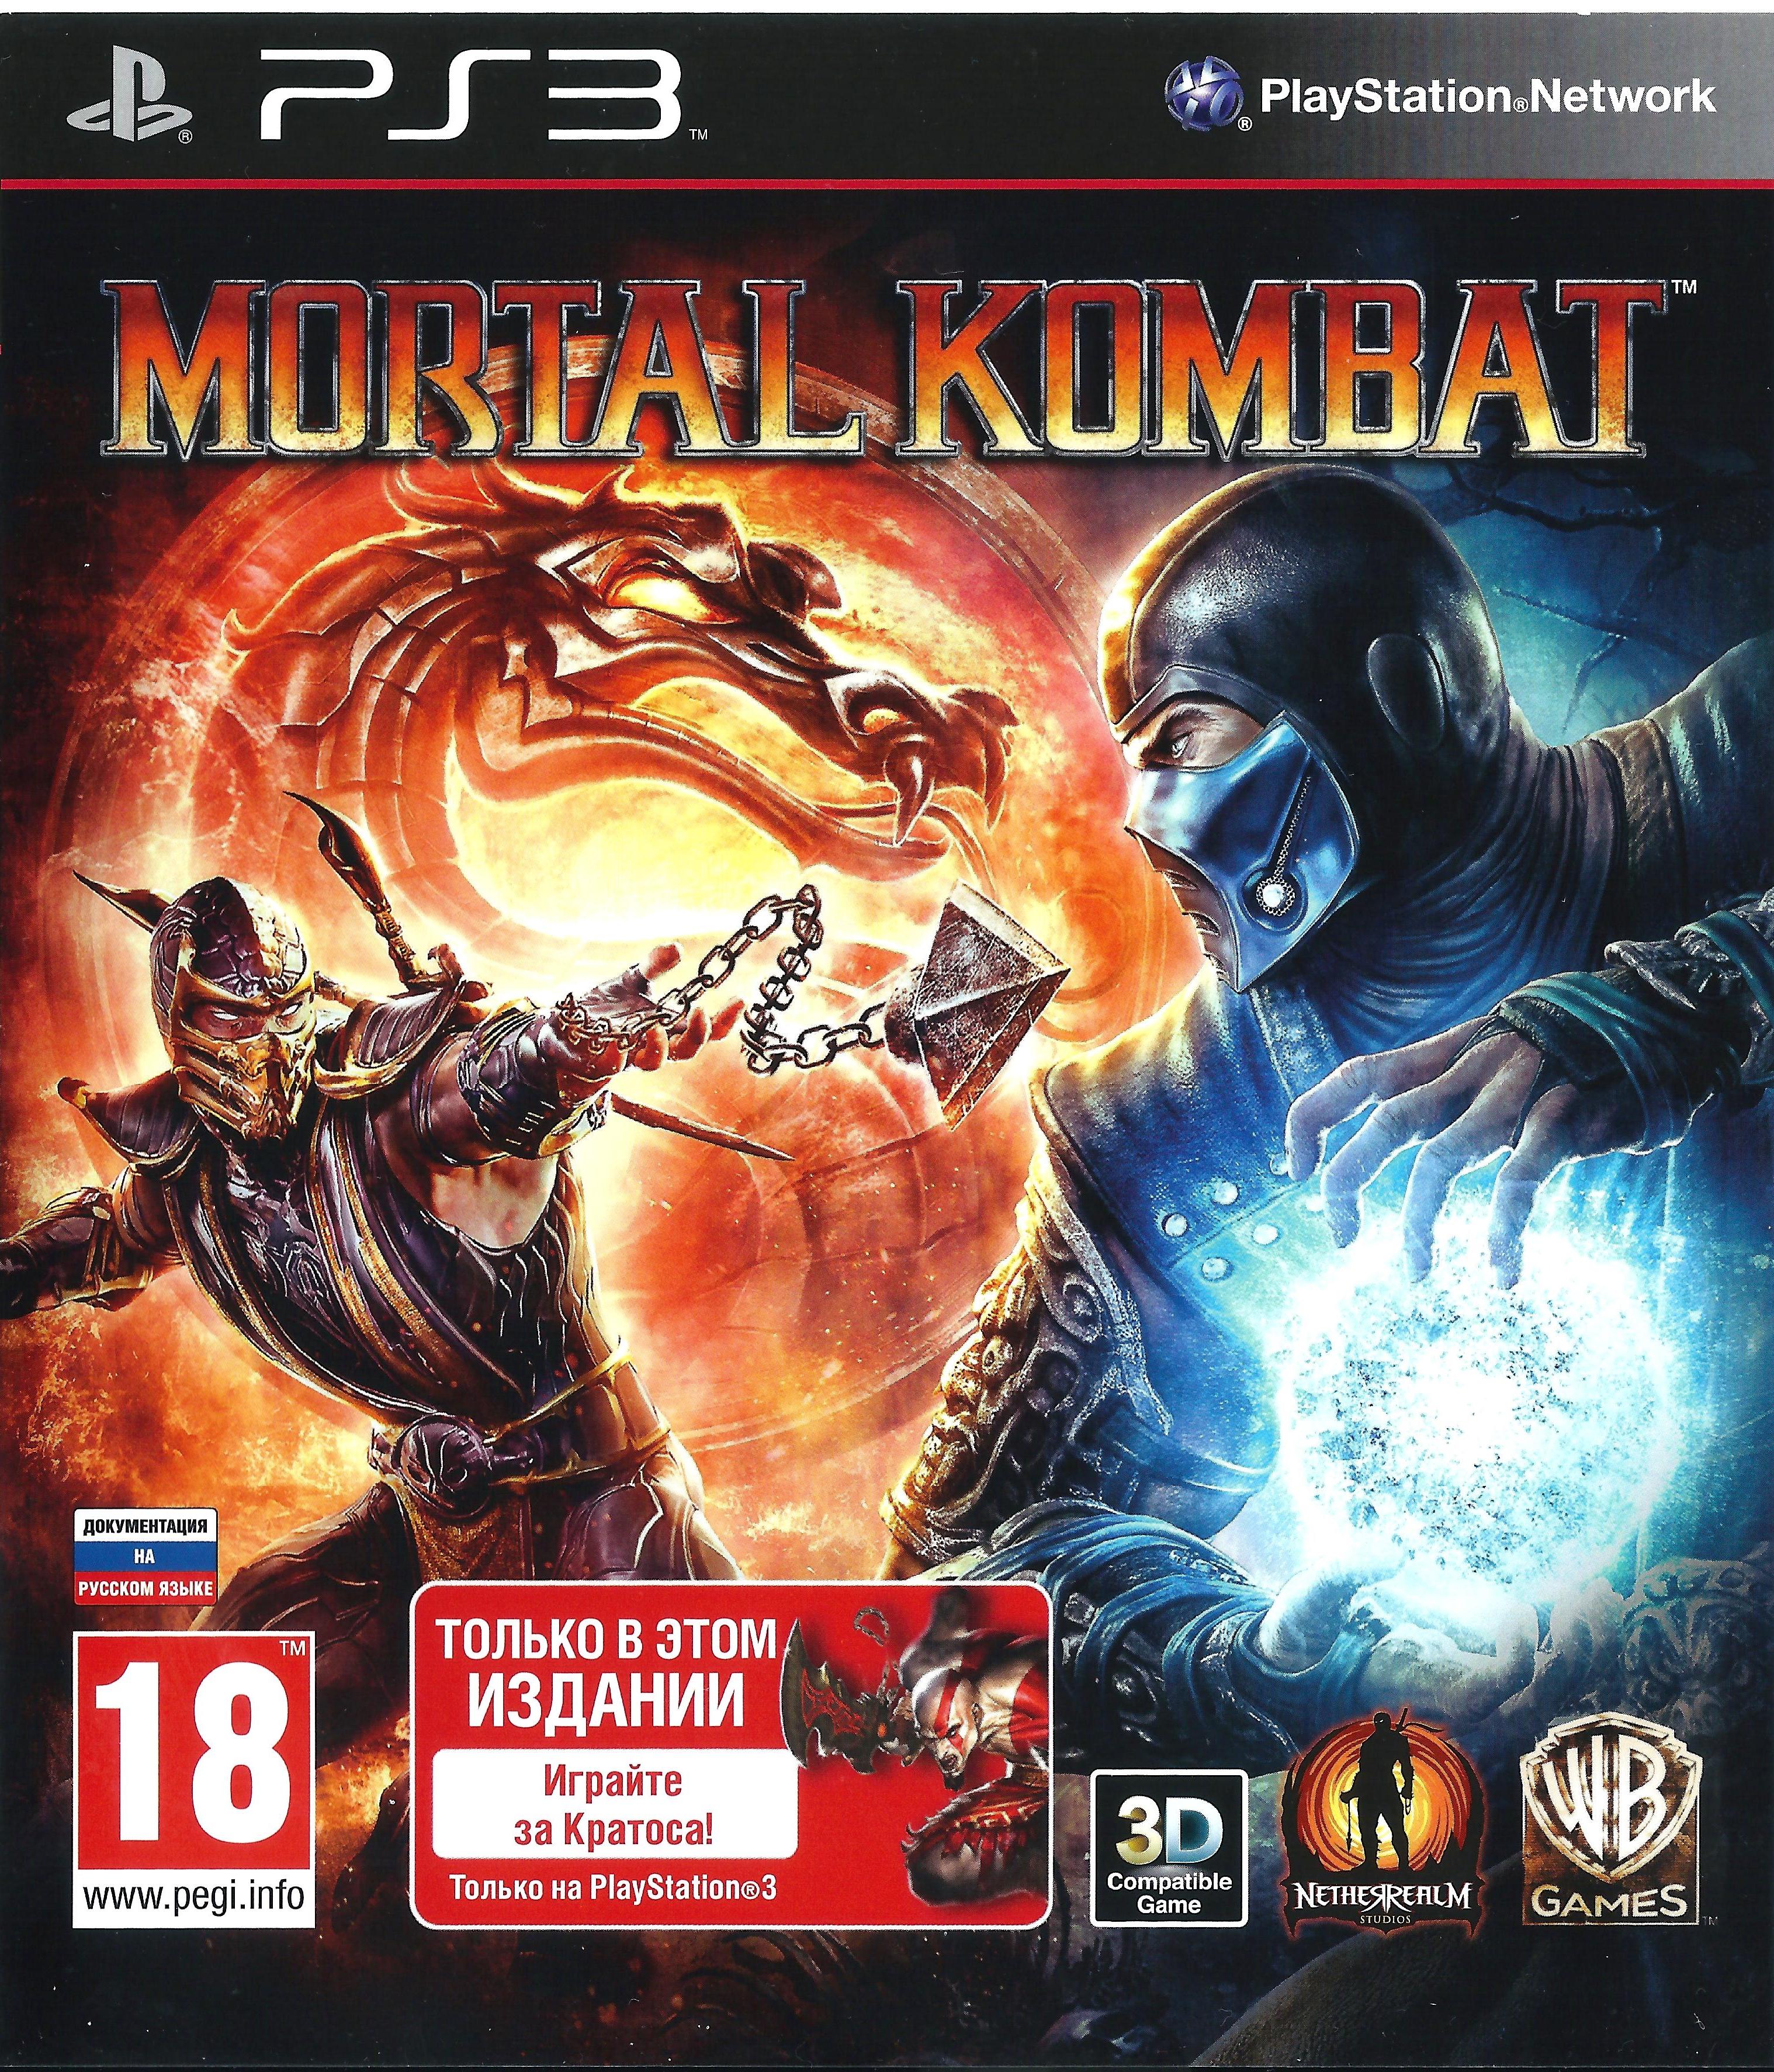 Mortal kombat (игра, 2011) — википедия.